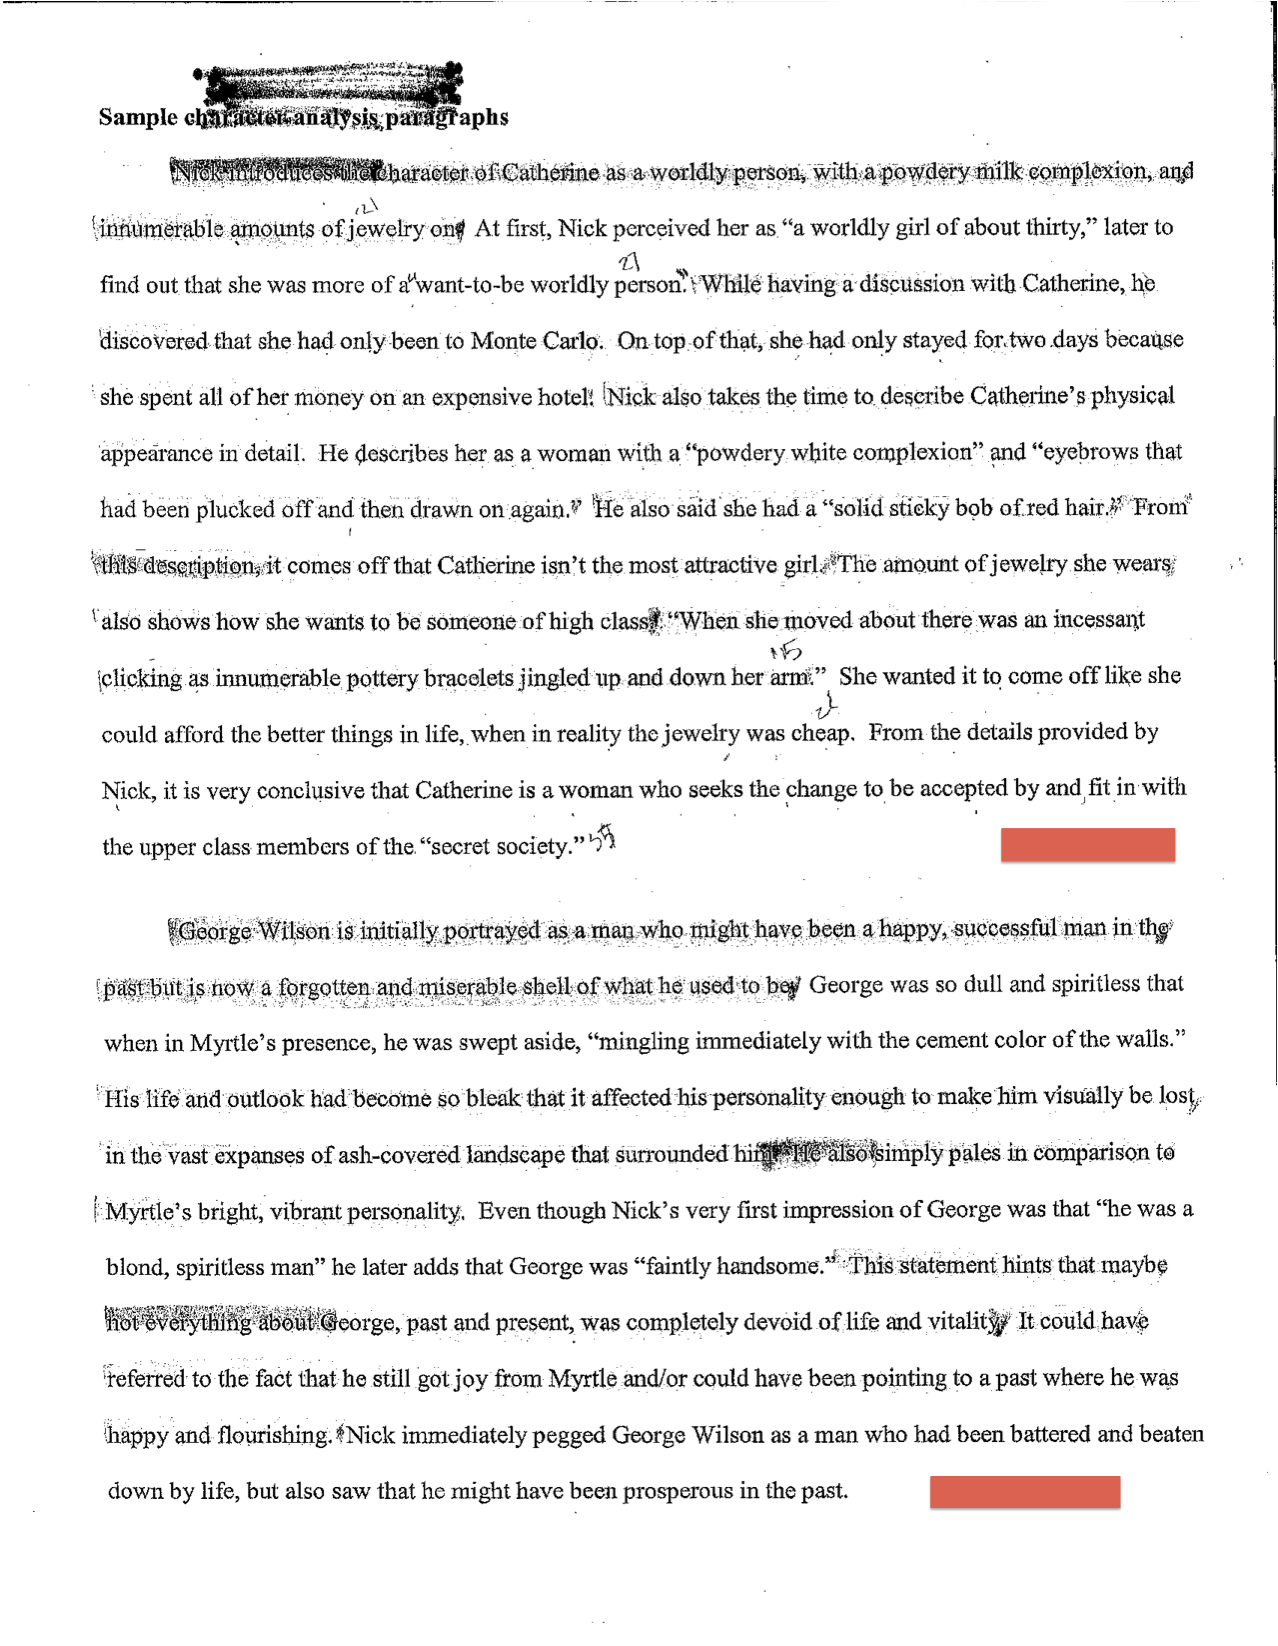 007 Essay Example Para Gre Rare Topics Argument Answers Magoosh Pool Full